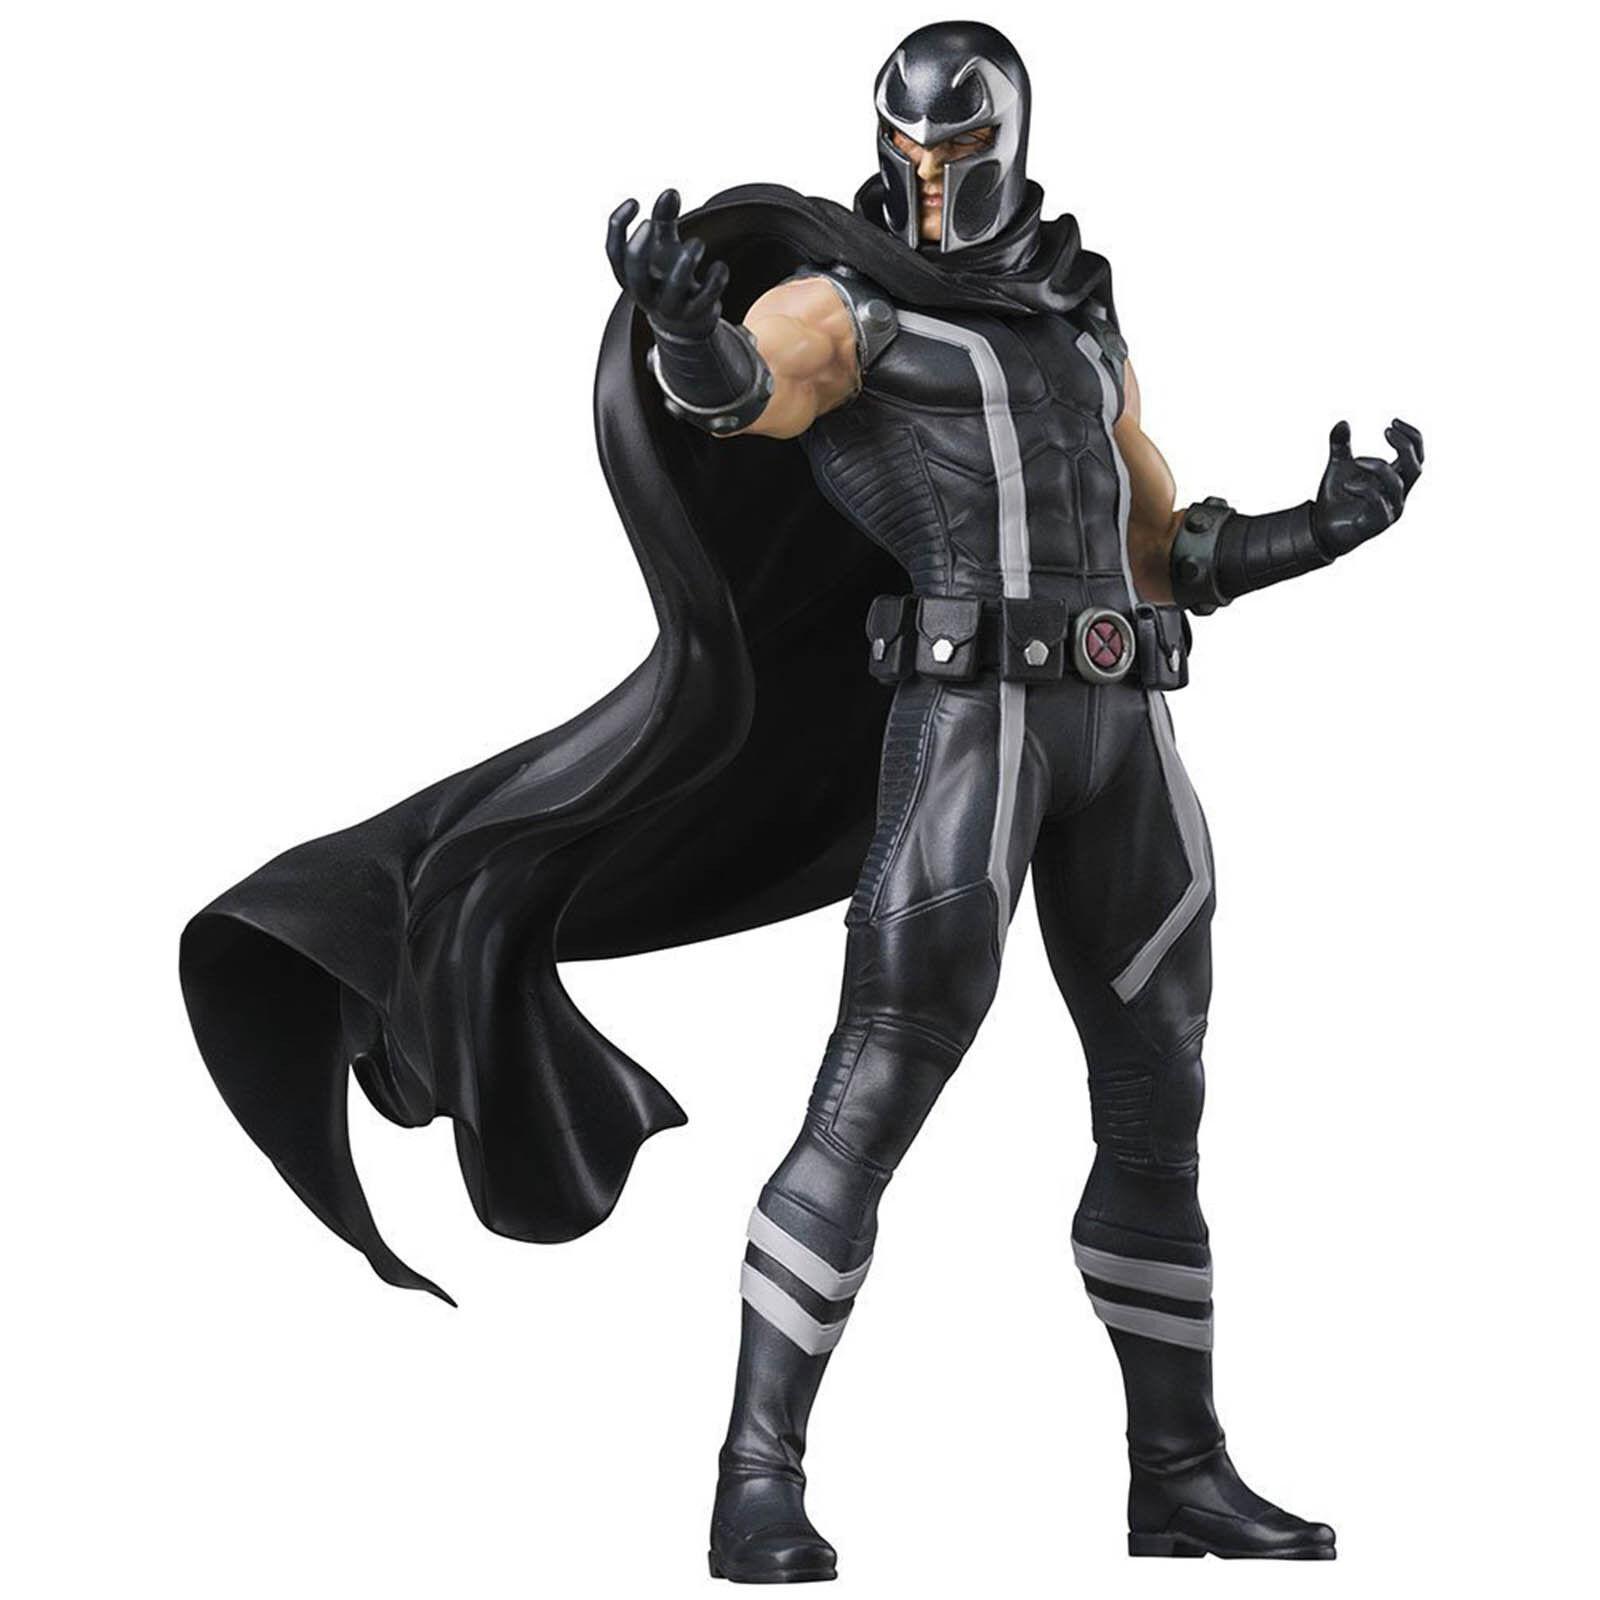 Kotobukiya Uncanny X-Men Magneto ArtFX Statue Figure Figure Figure NEW Collectibles Toys a21c7c